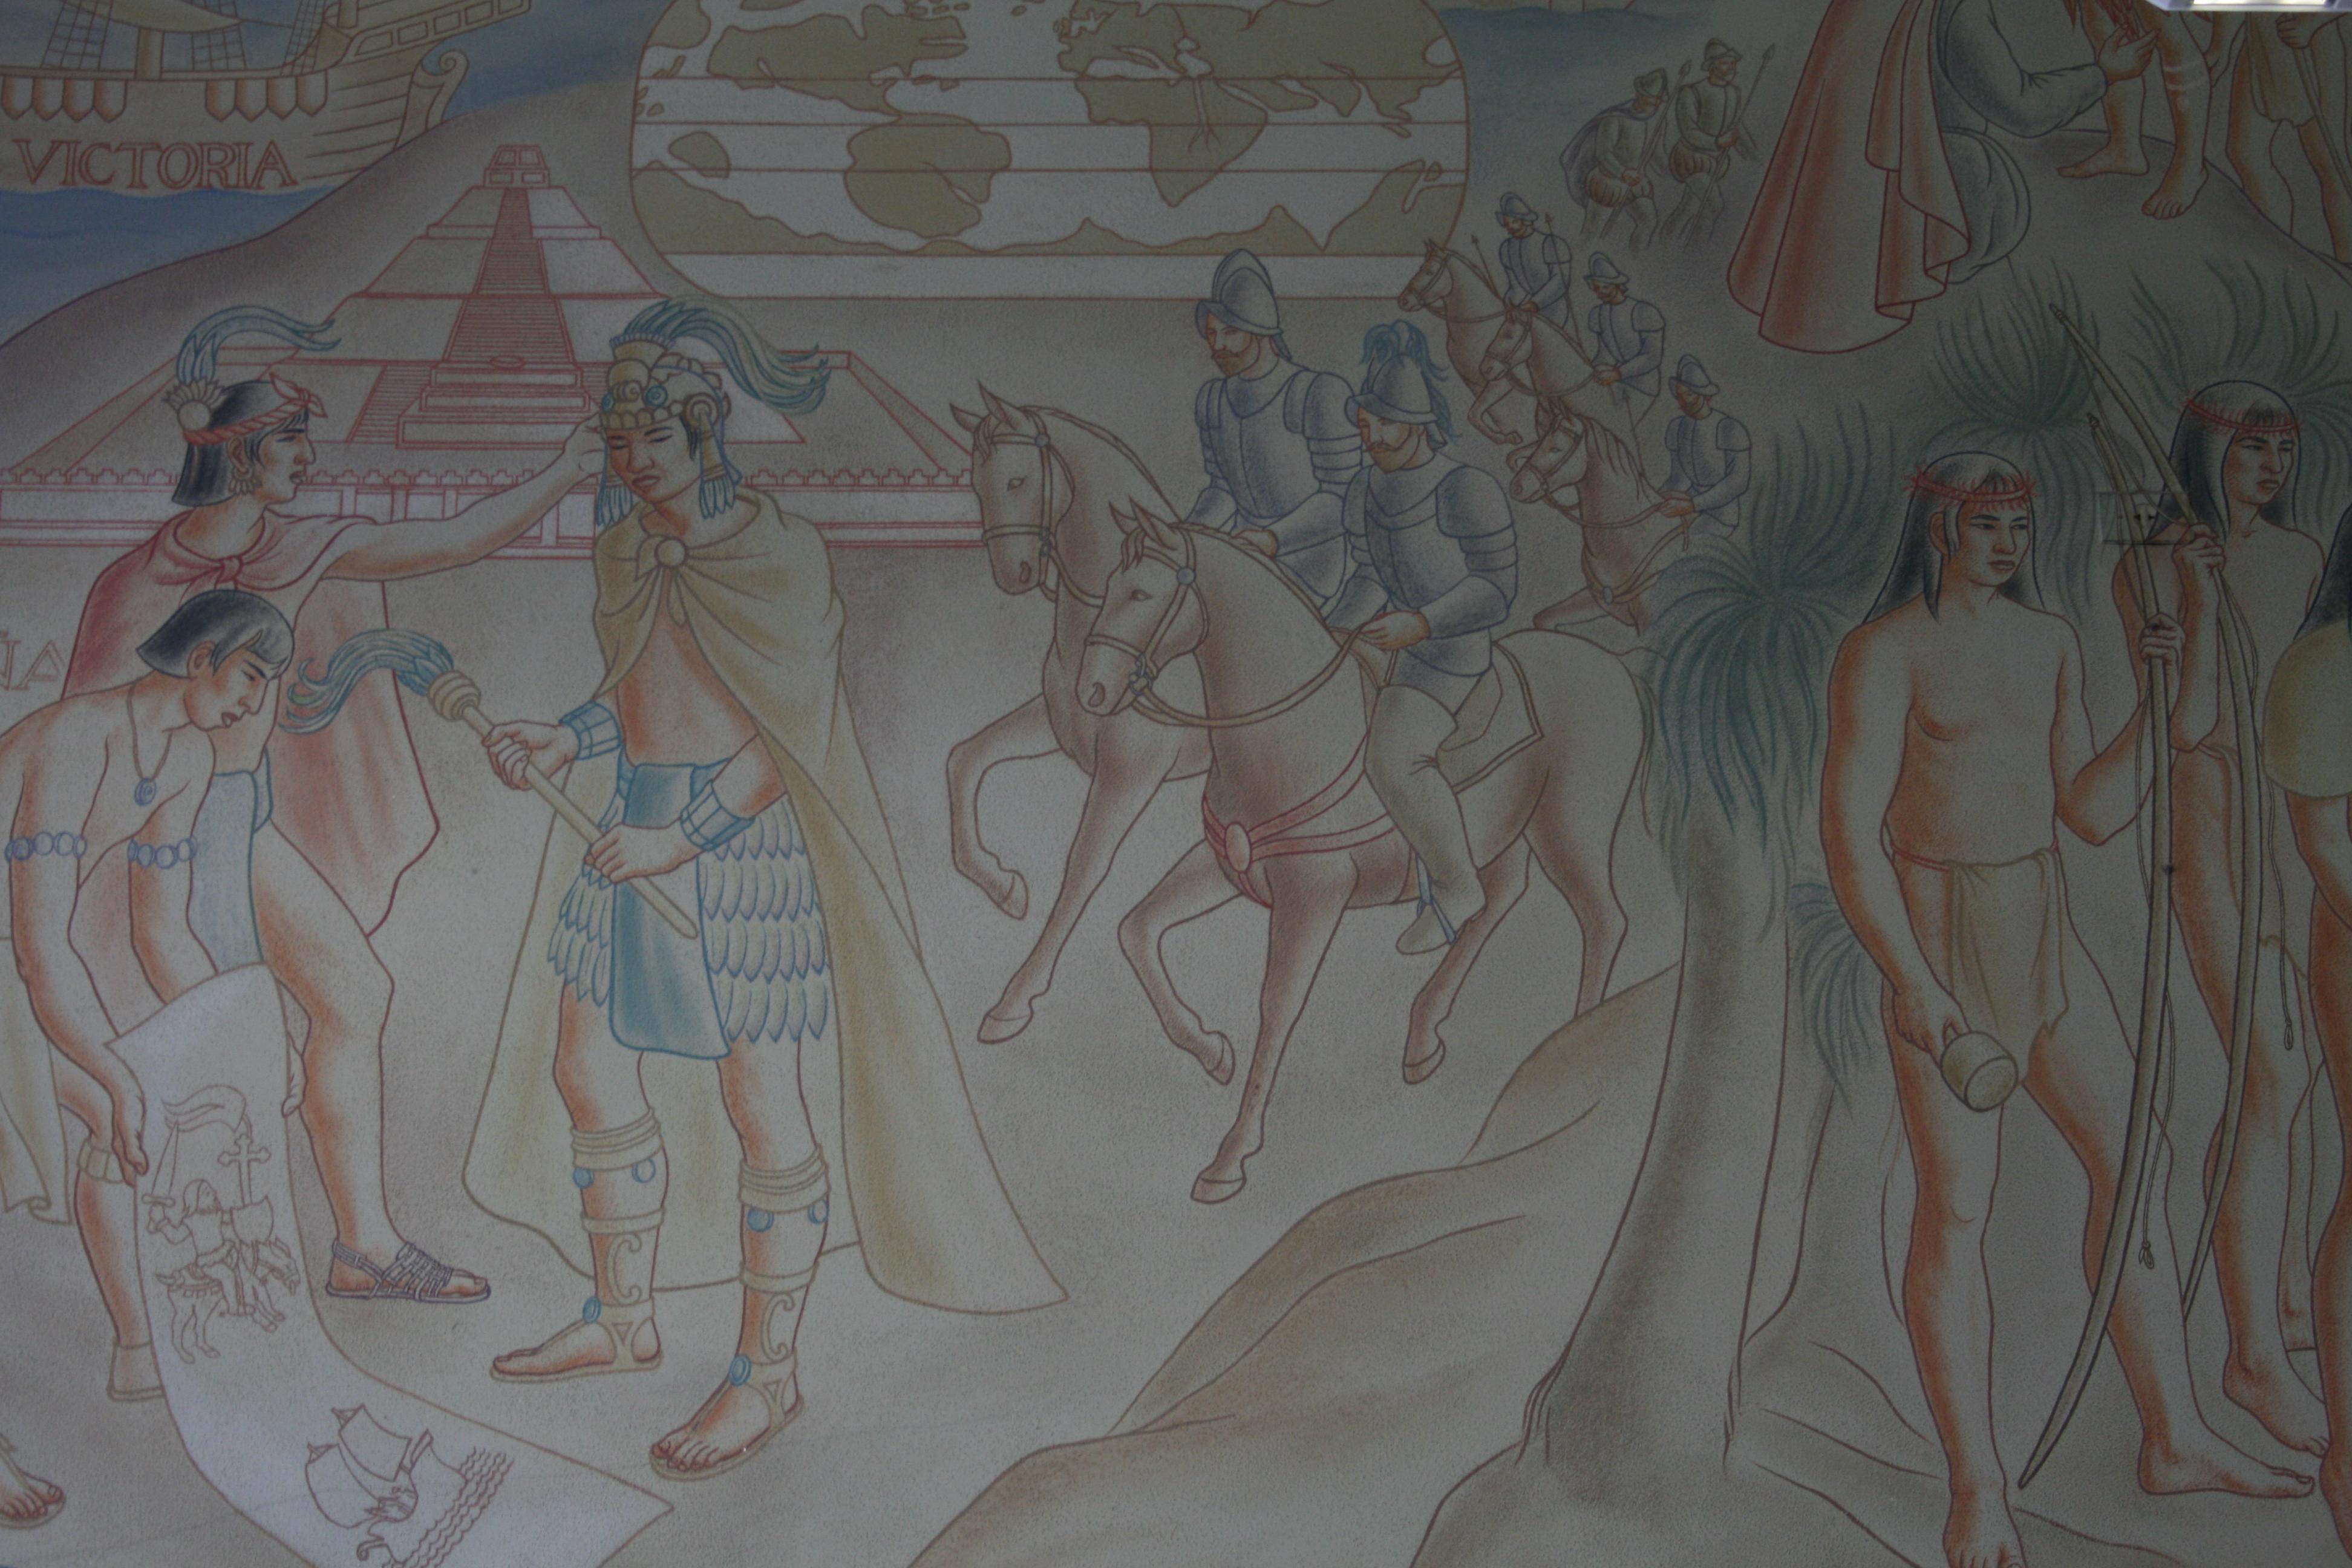 """History of Early California"""